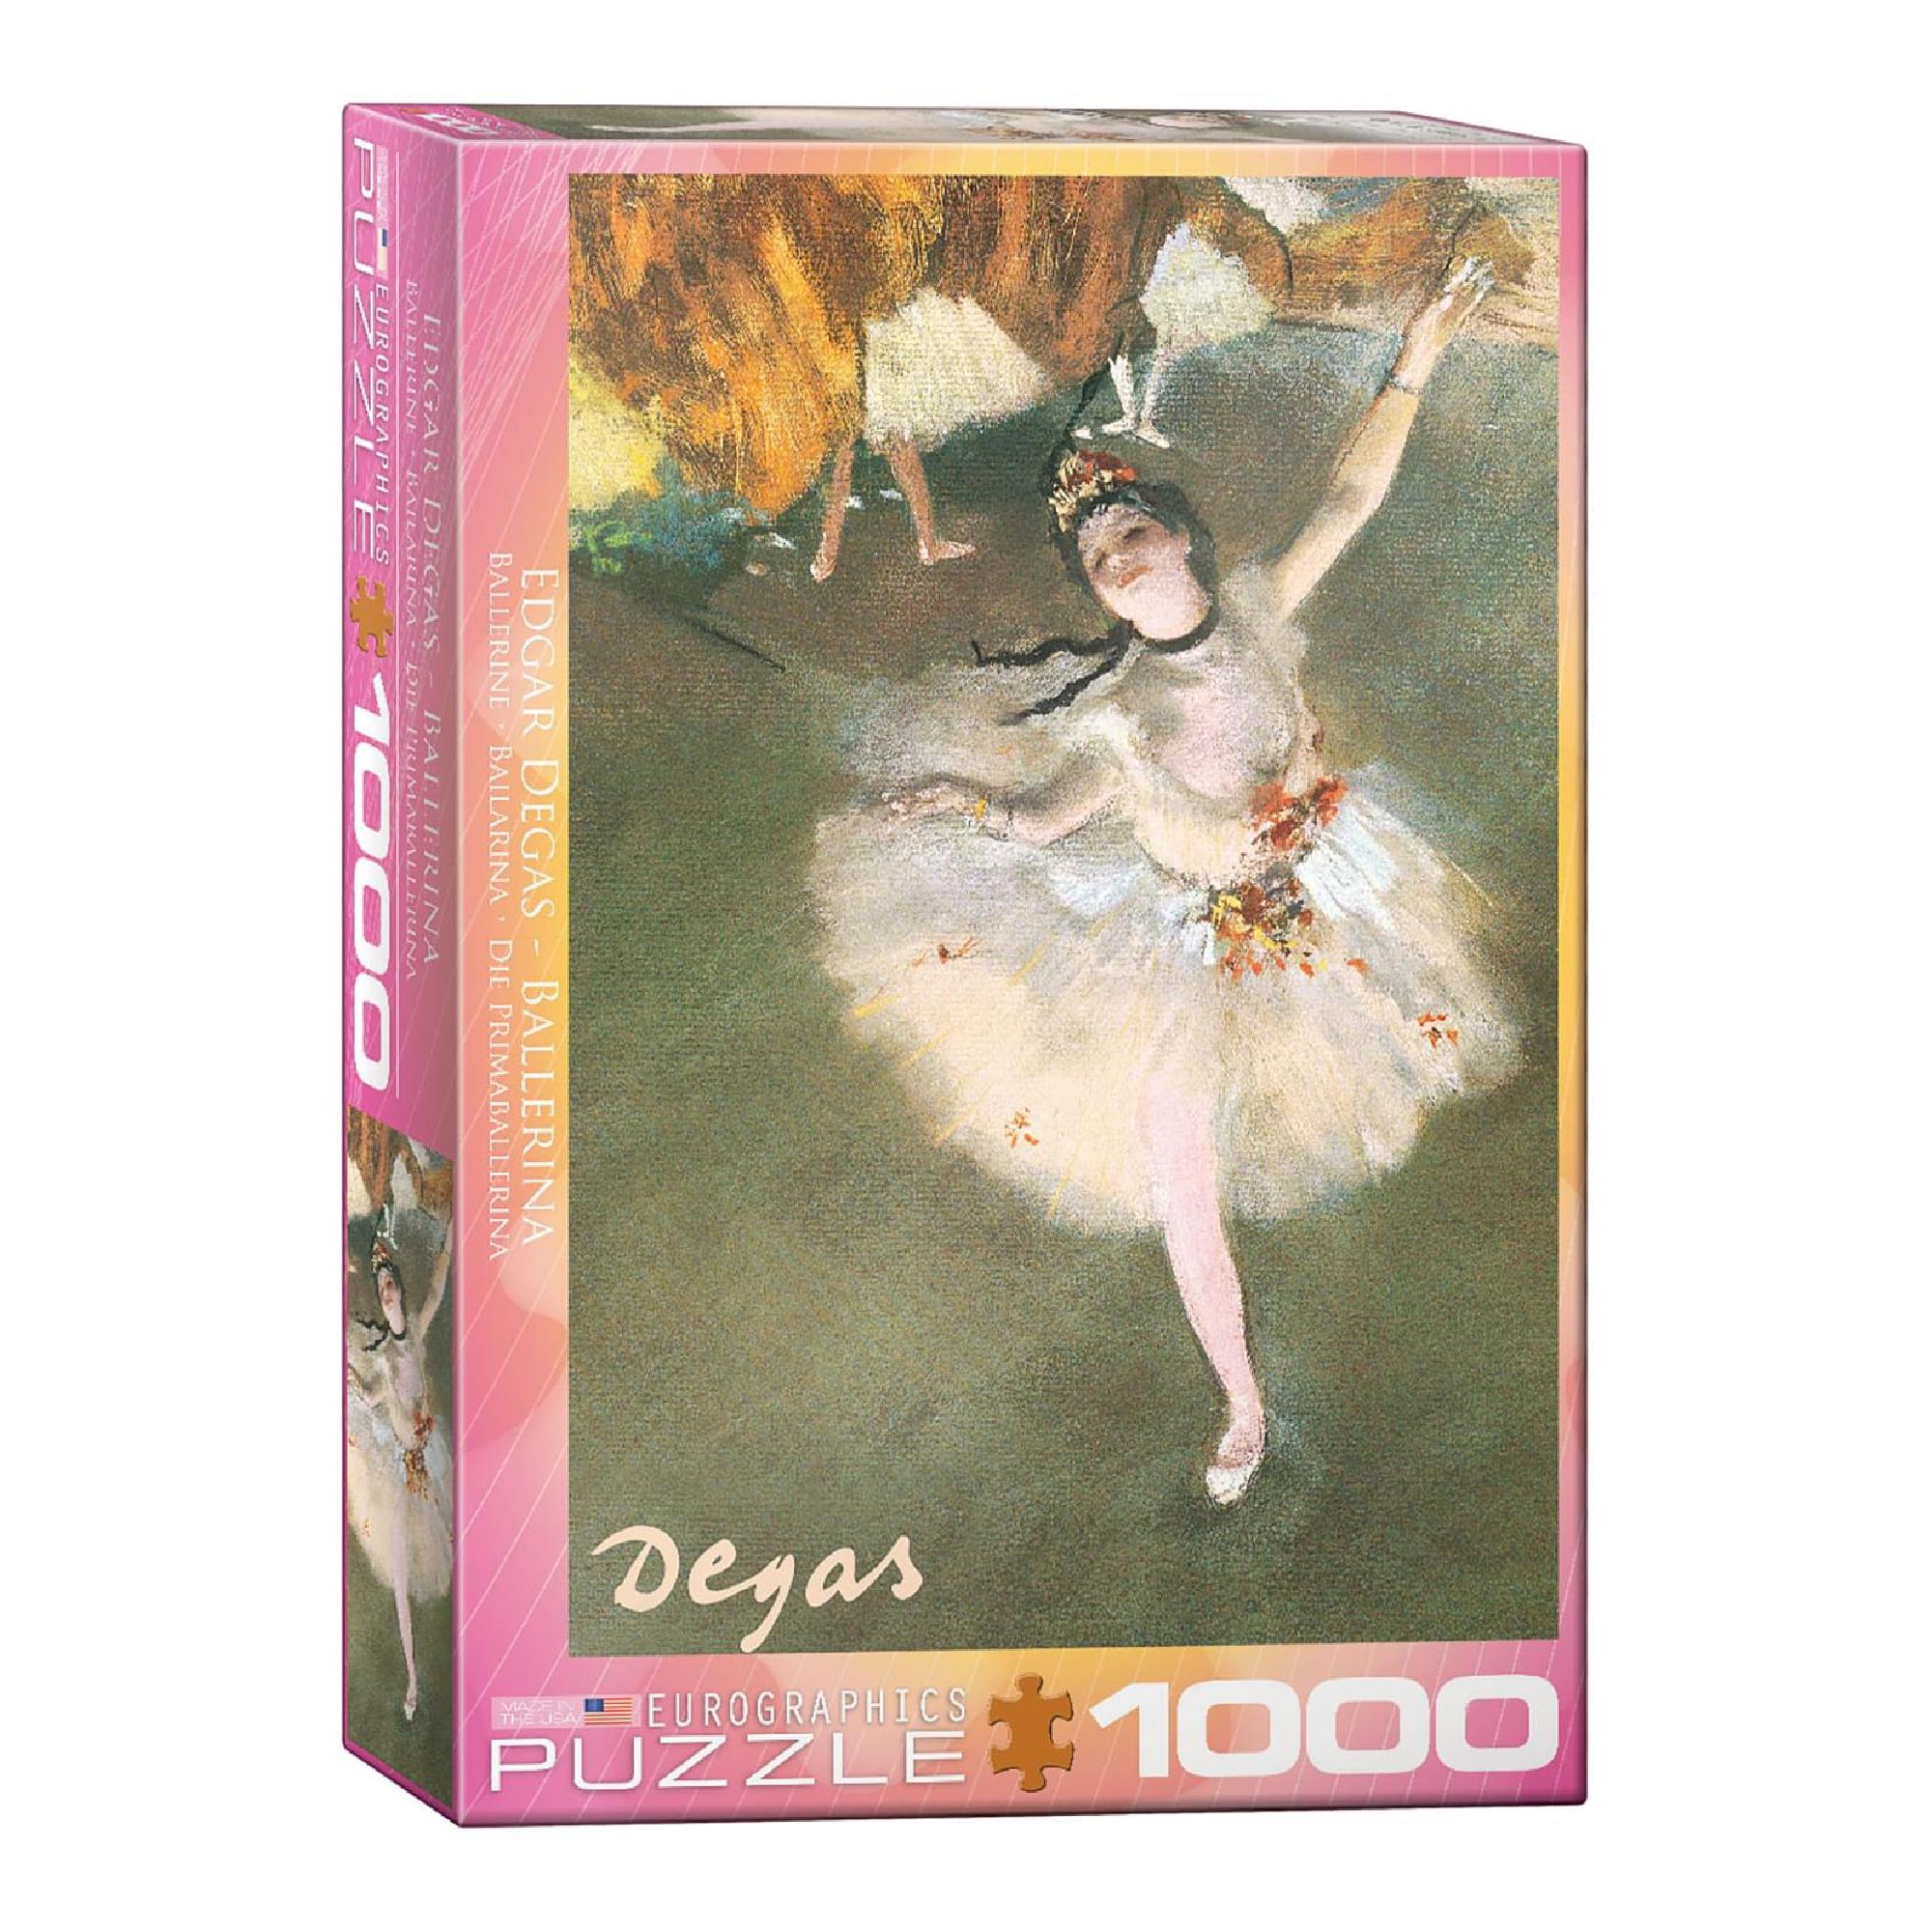 Eurographics Puzzle 1000: Ballerina by Edgar Dagas